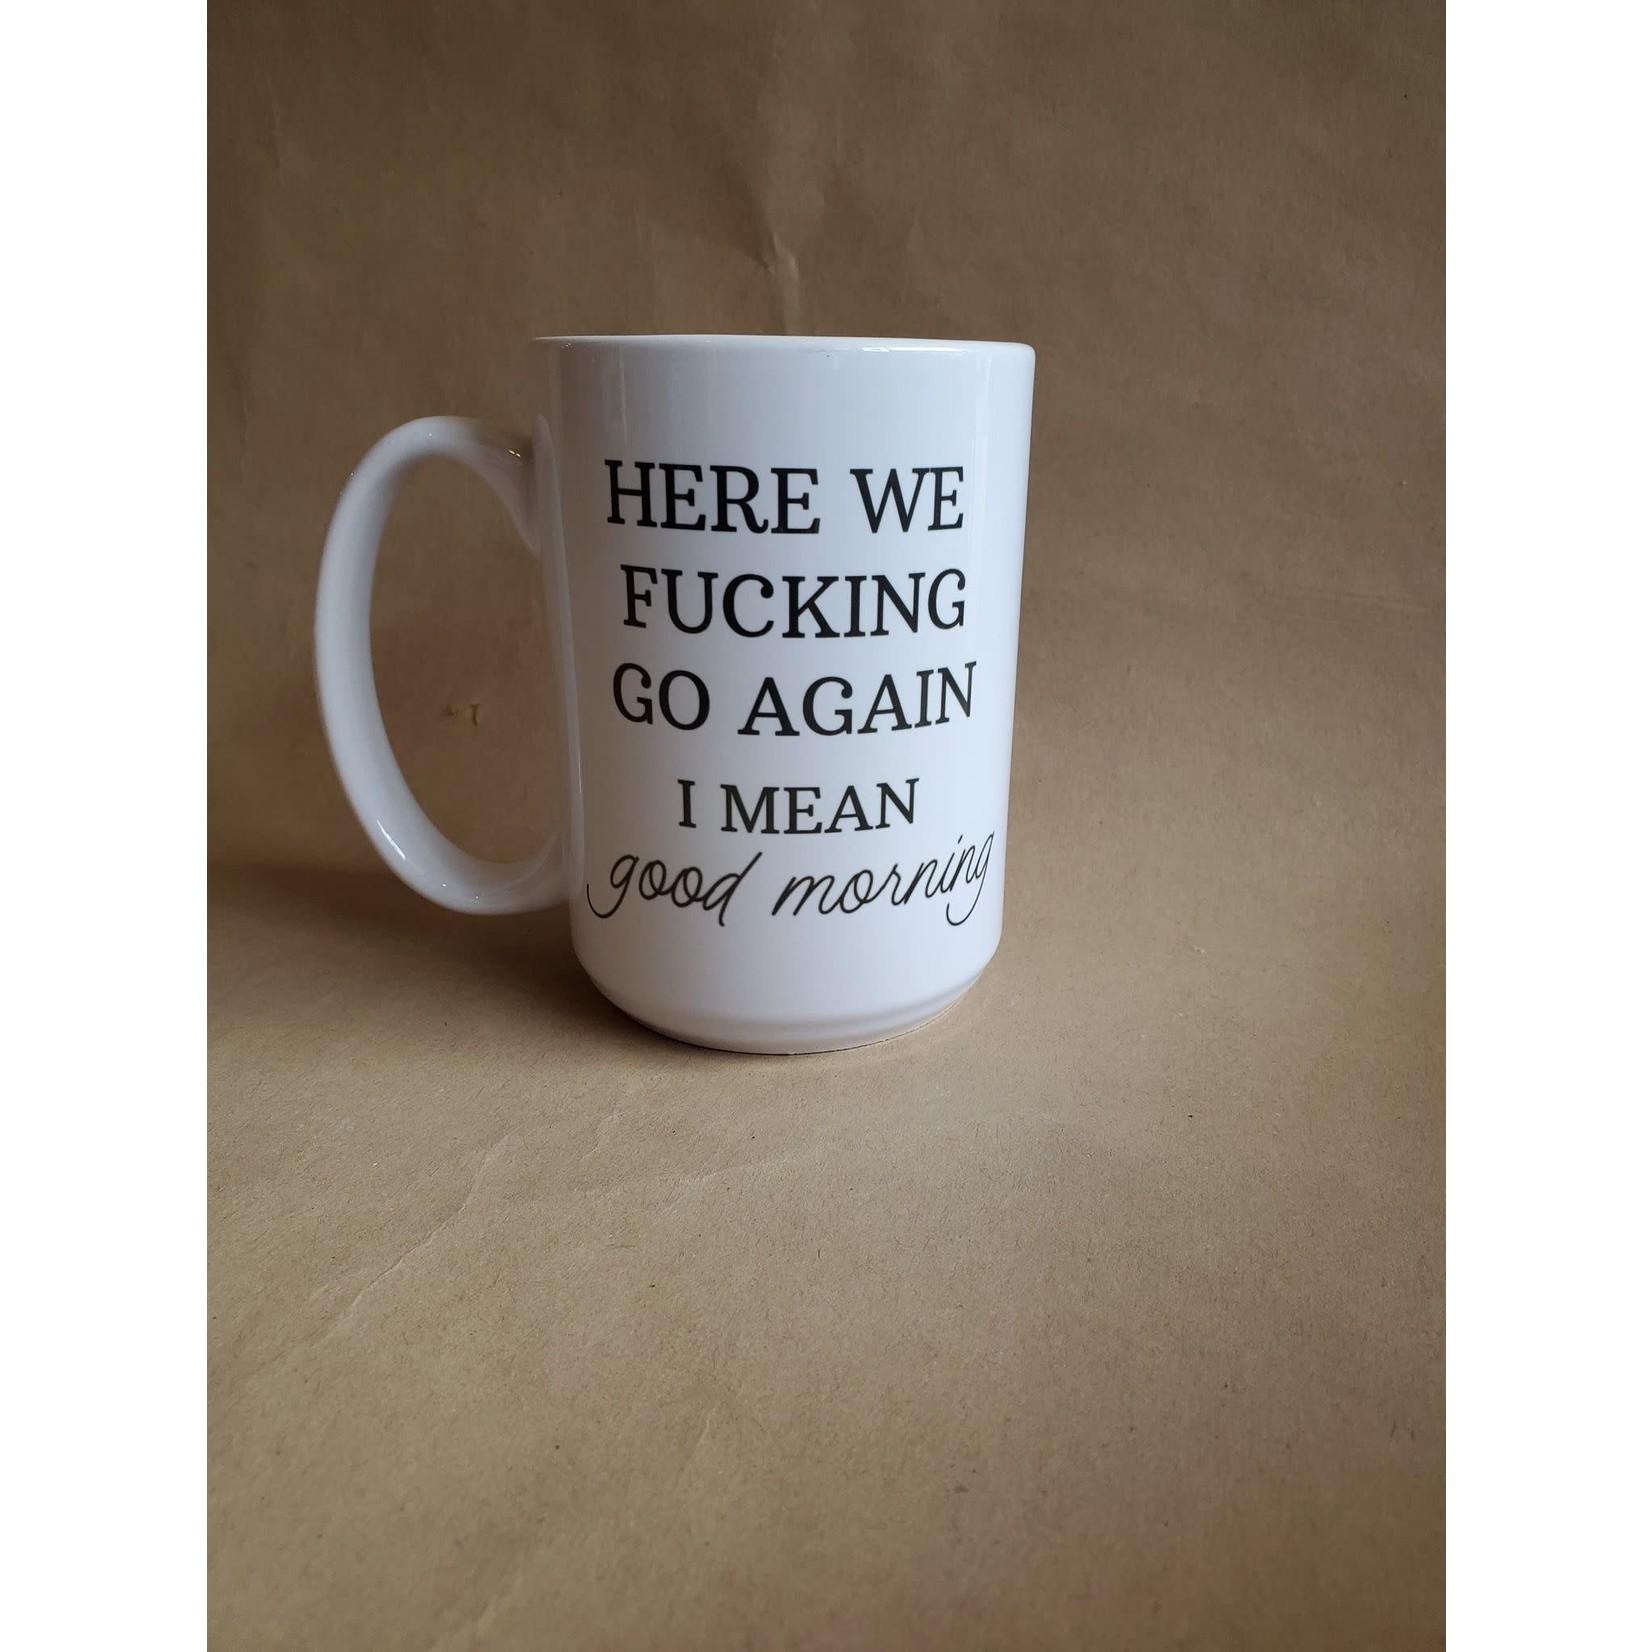 favourite things apparel Here we fucking go again mug